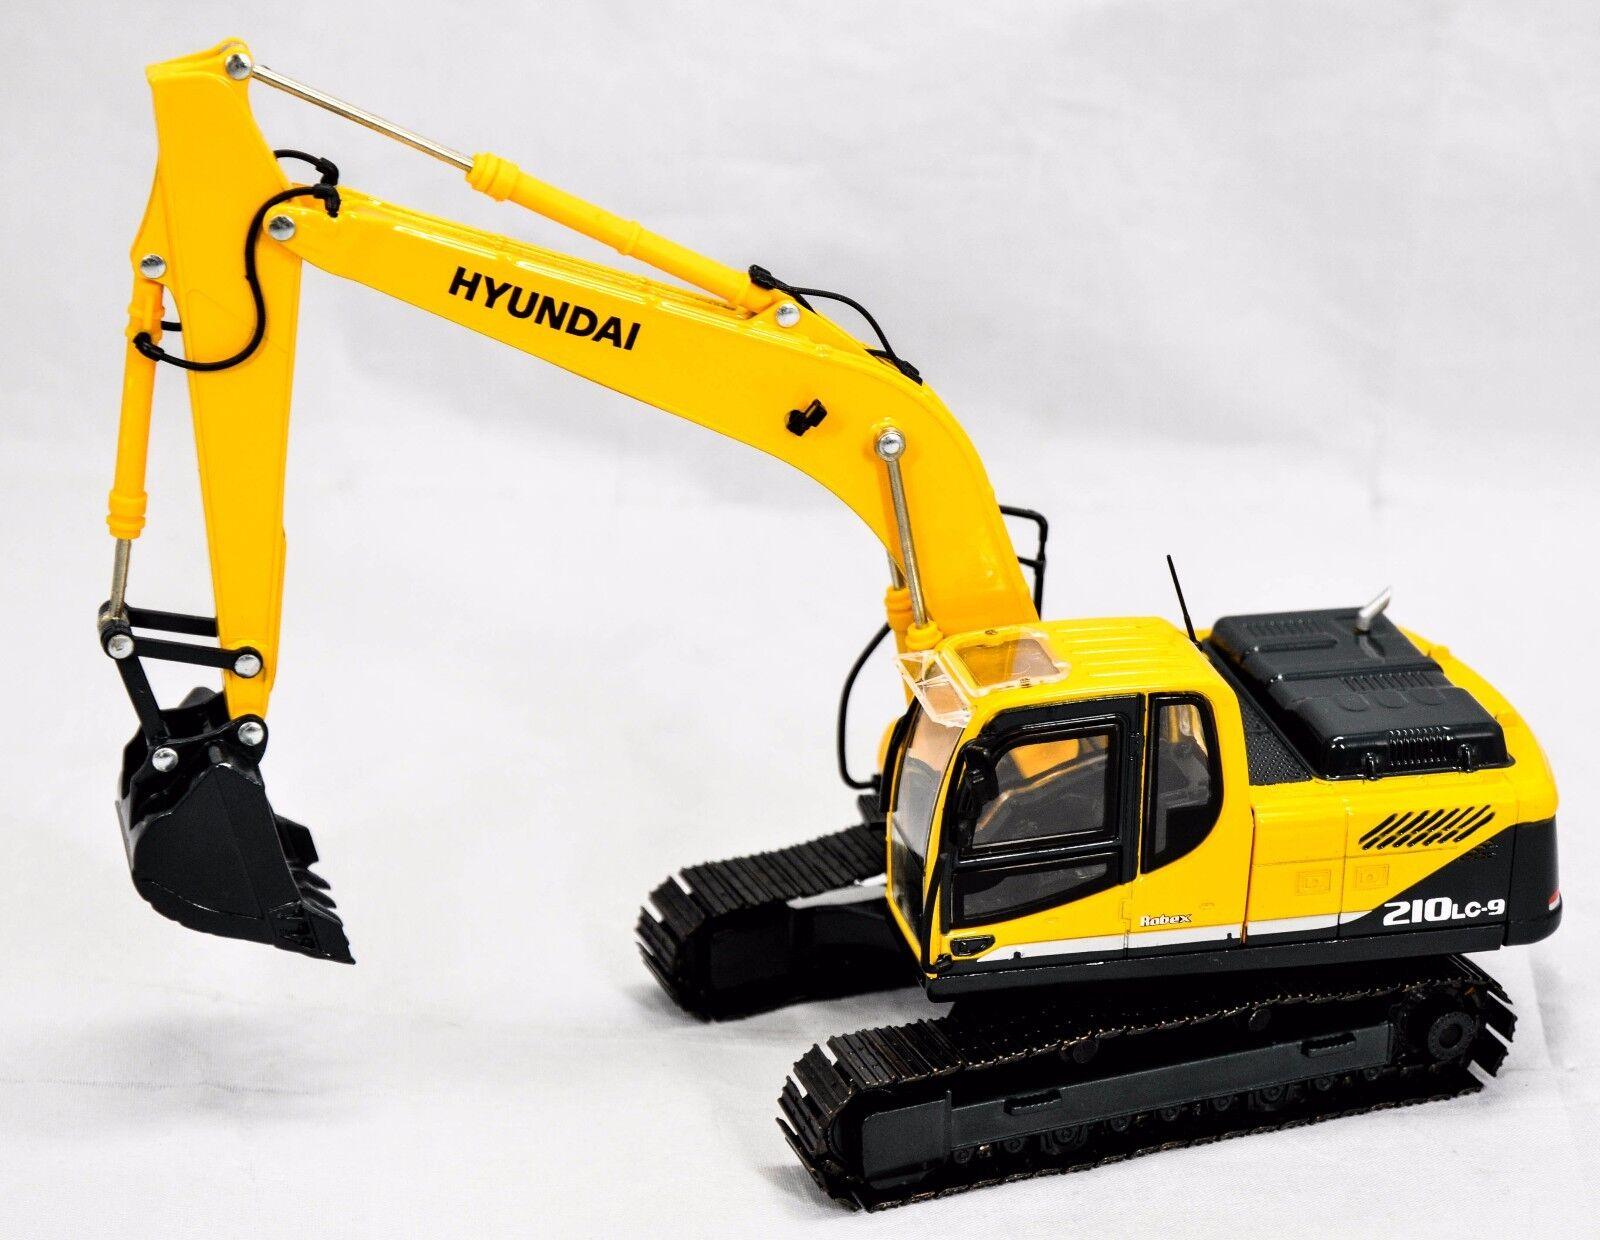 HYUNDAI HYUNDAI HYUNDAI Heavy Industries reconfigurable